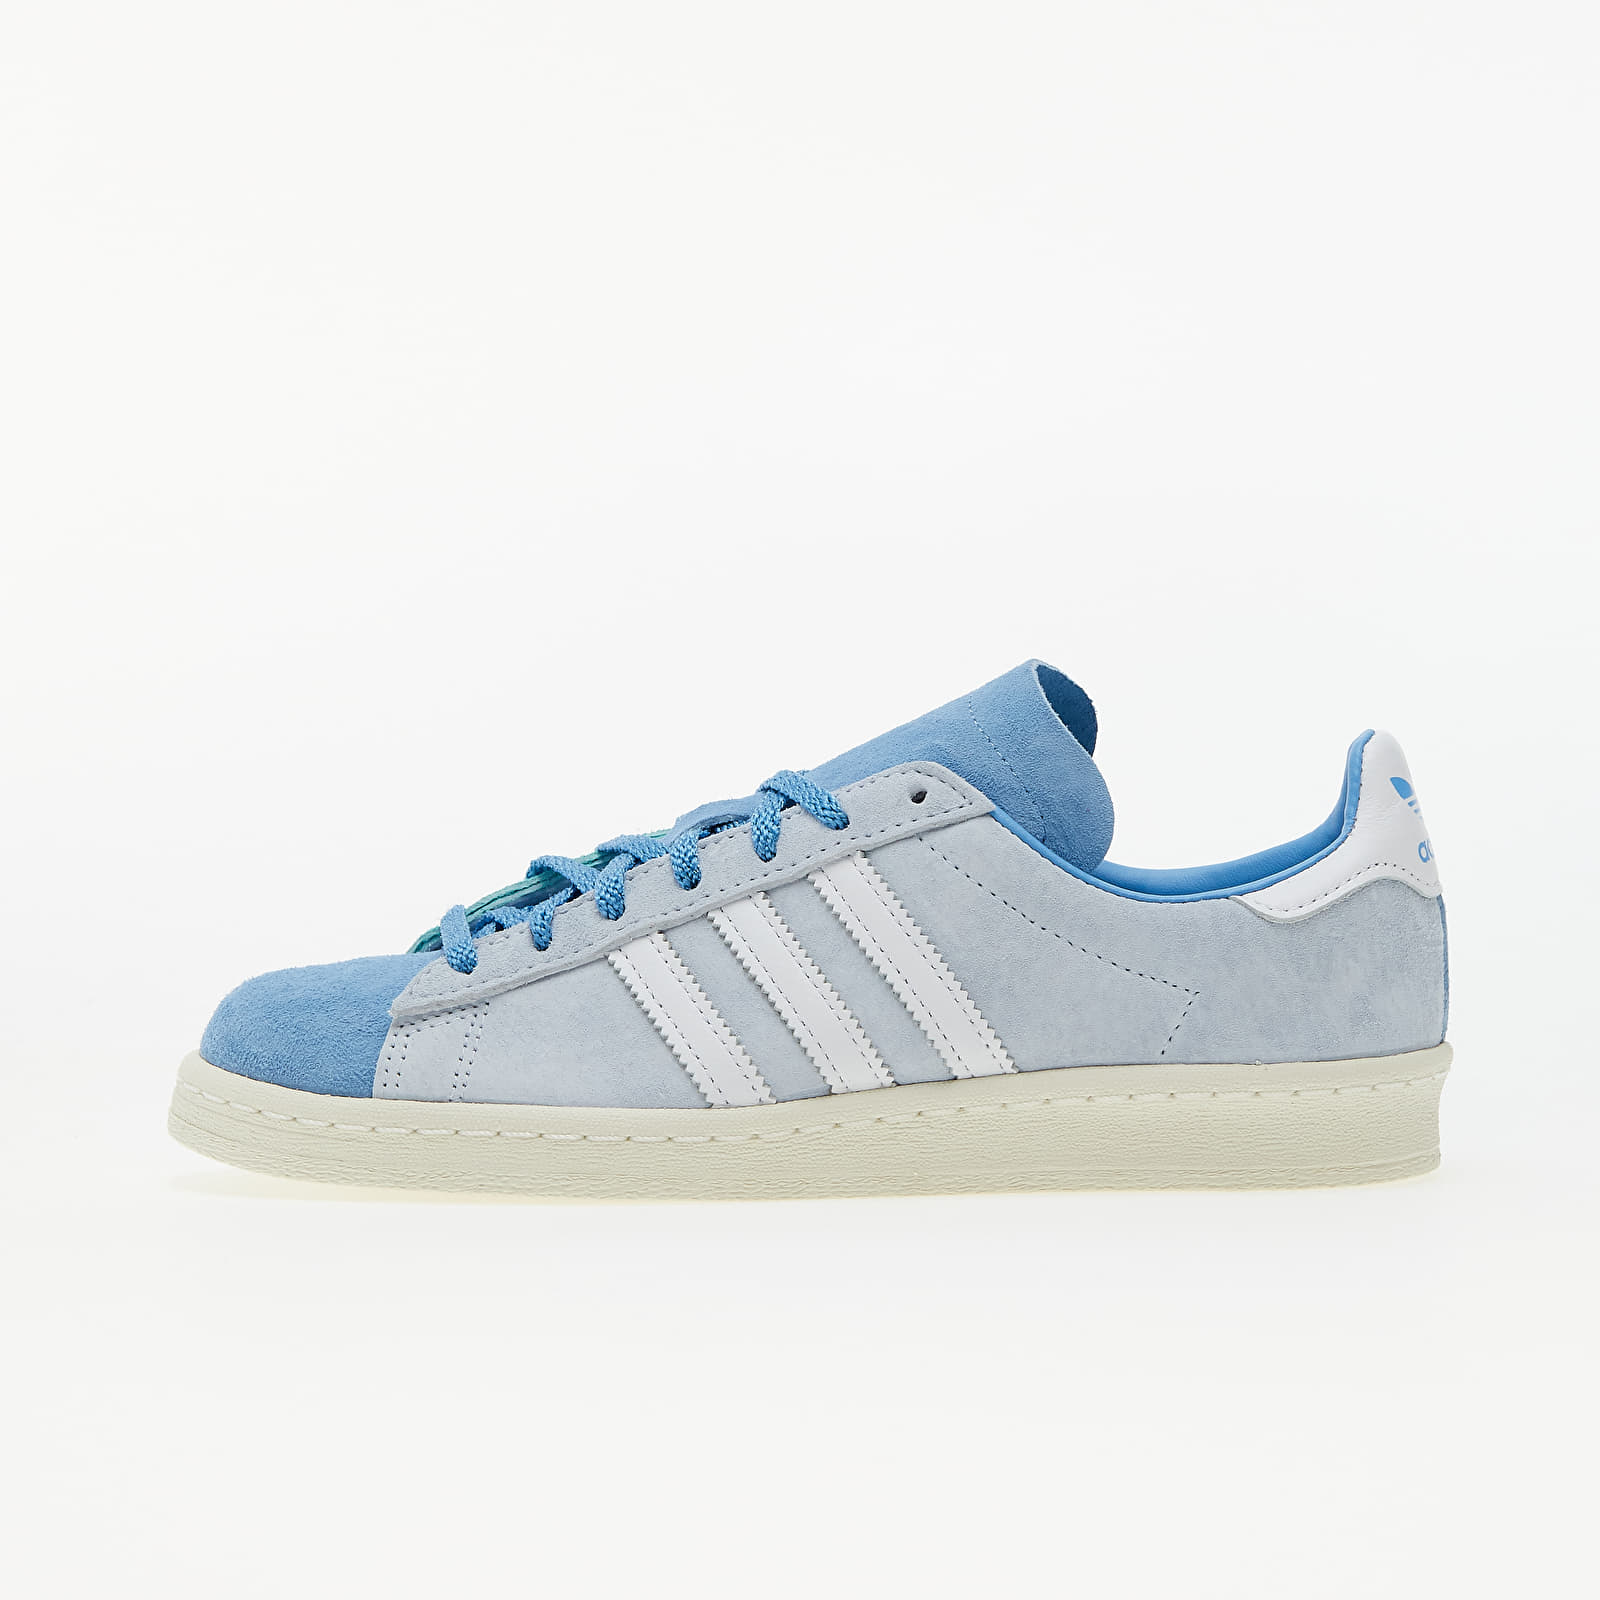 adidas Campus 80s W Halo Blue/ Ftw White/ Haze Blue FY3549